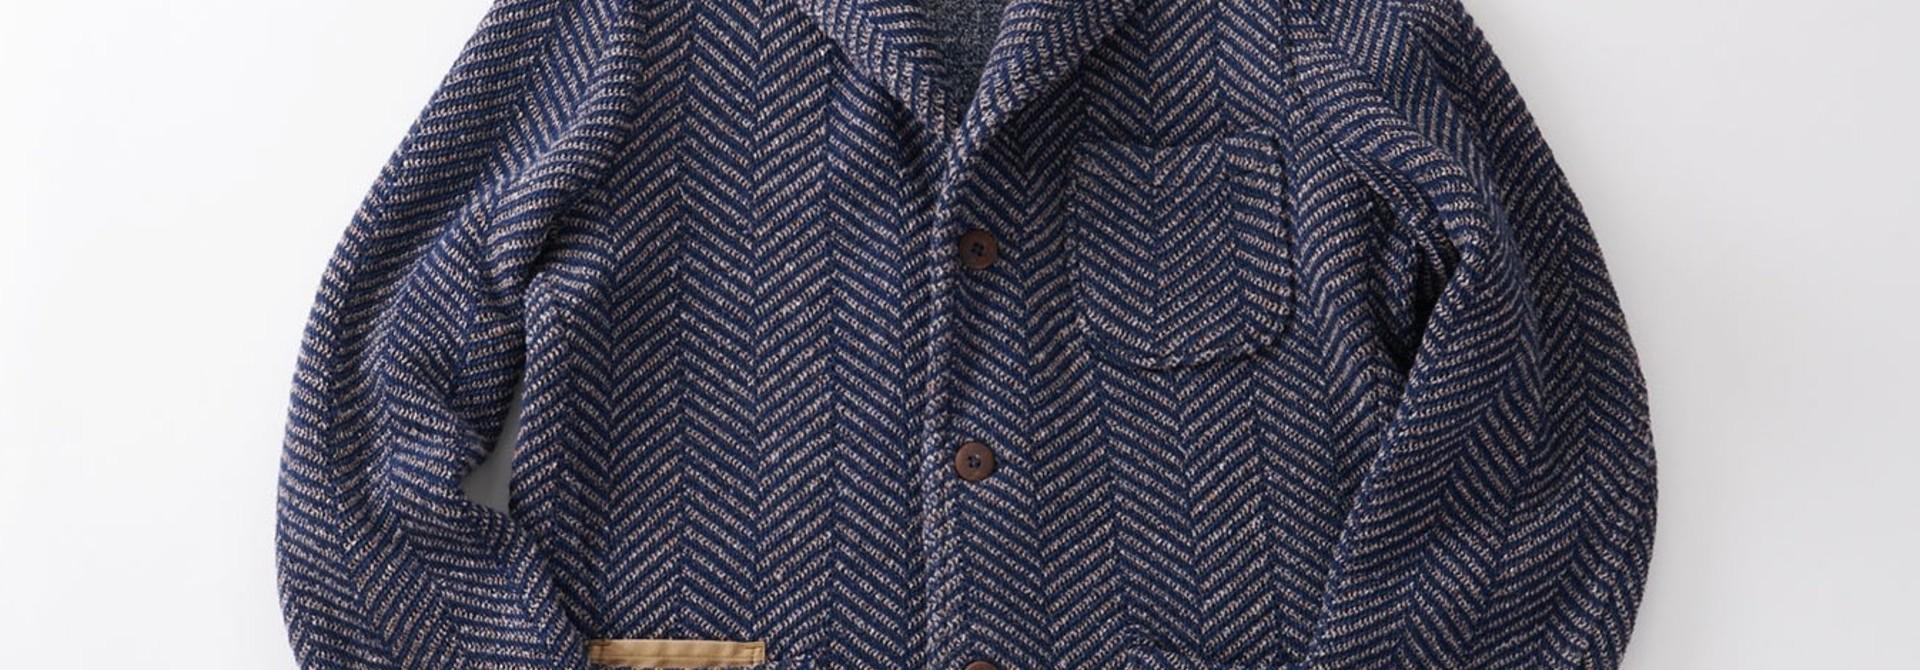 Indigo Cotton Tweed Knit Jacket